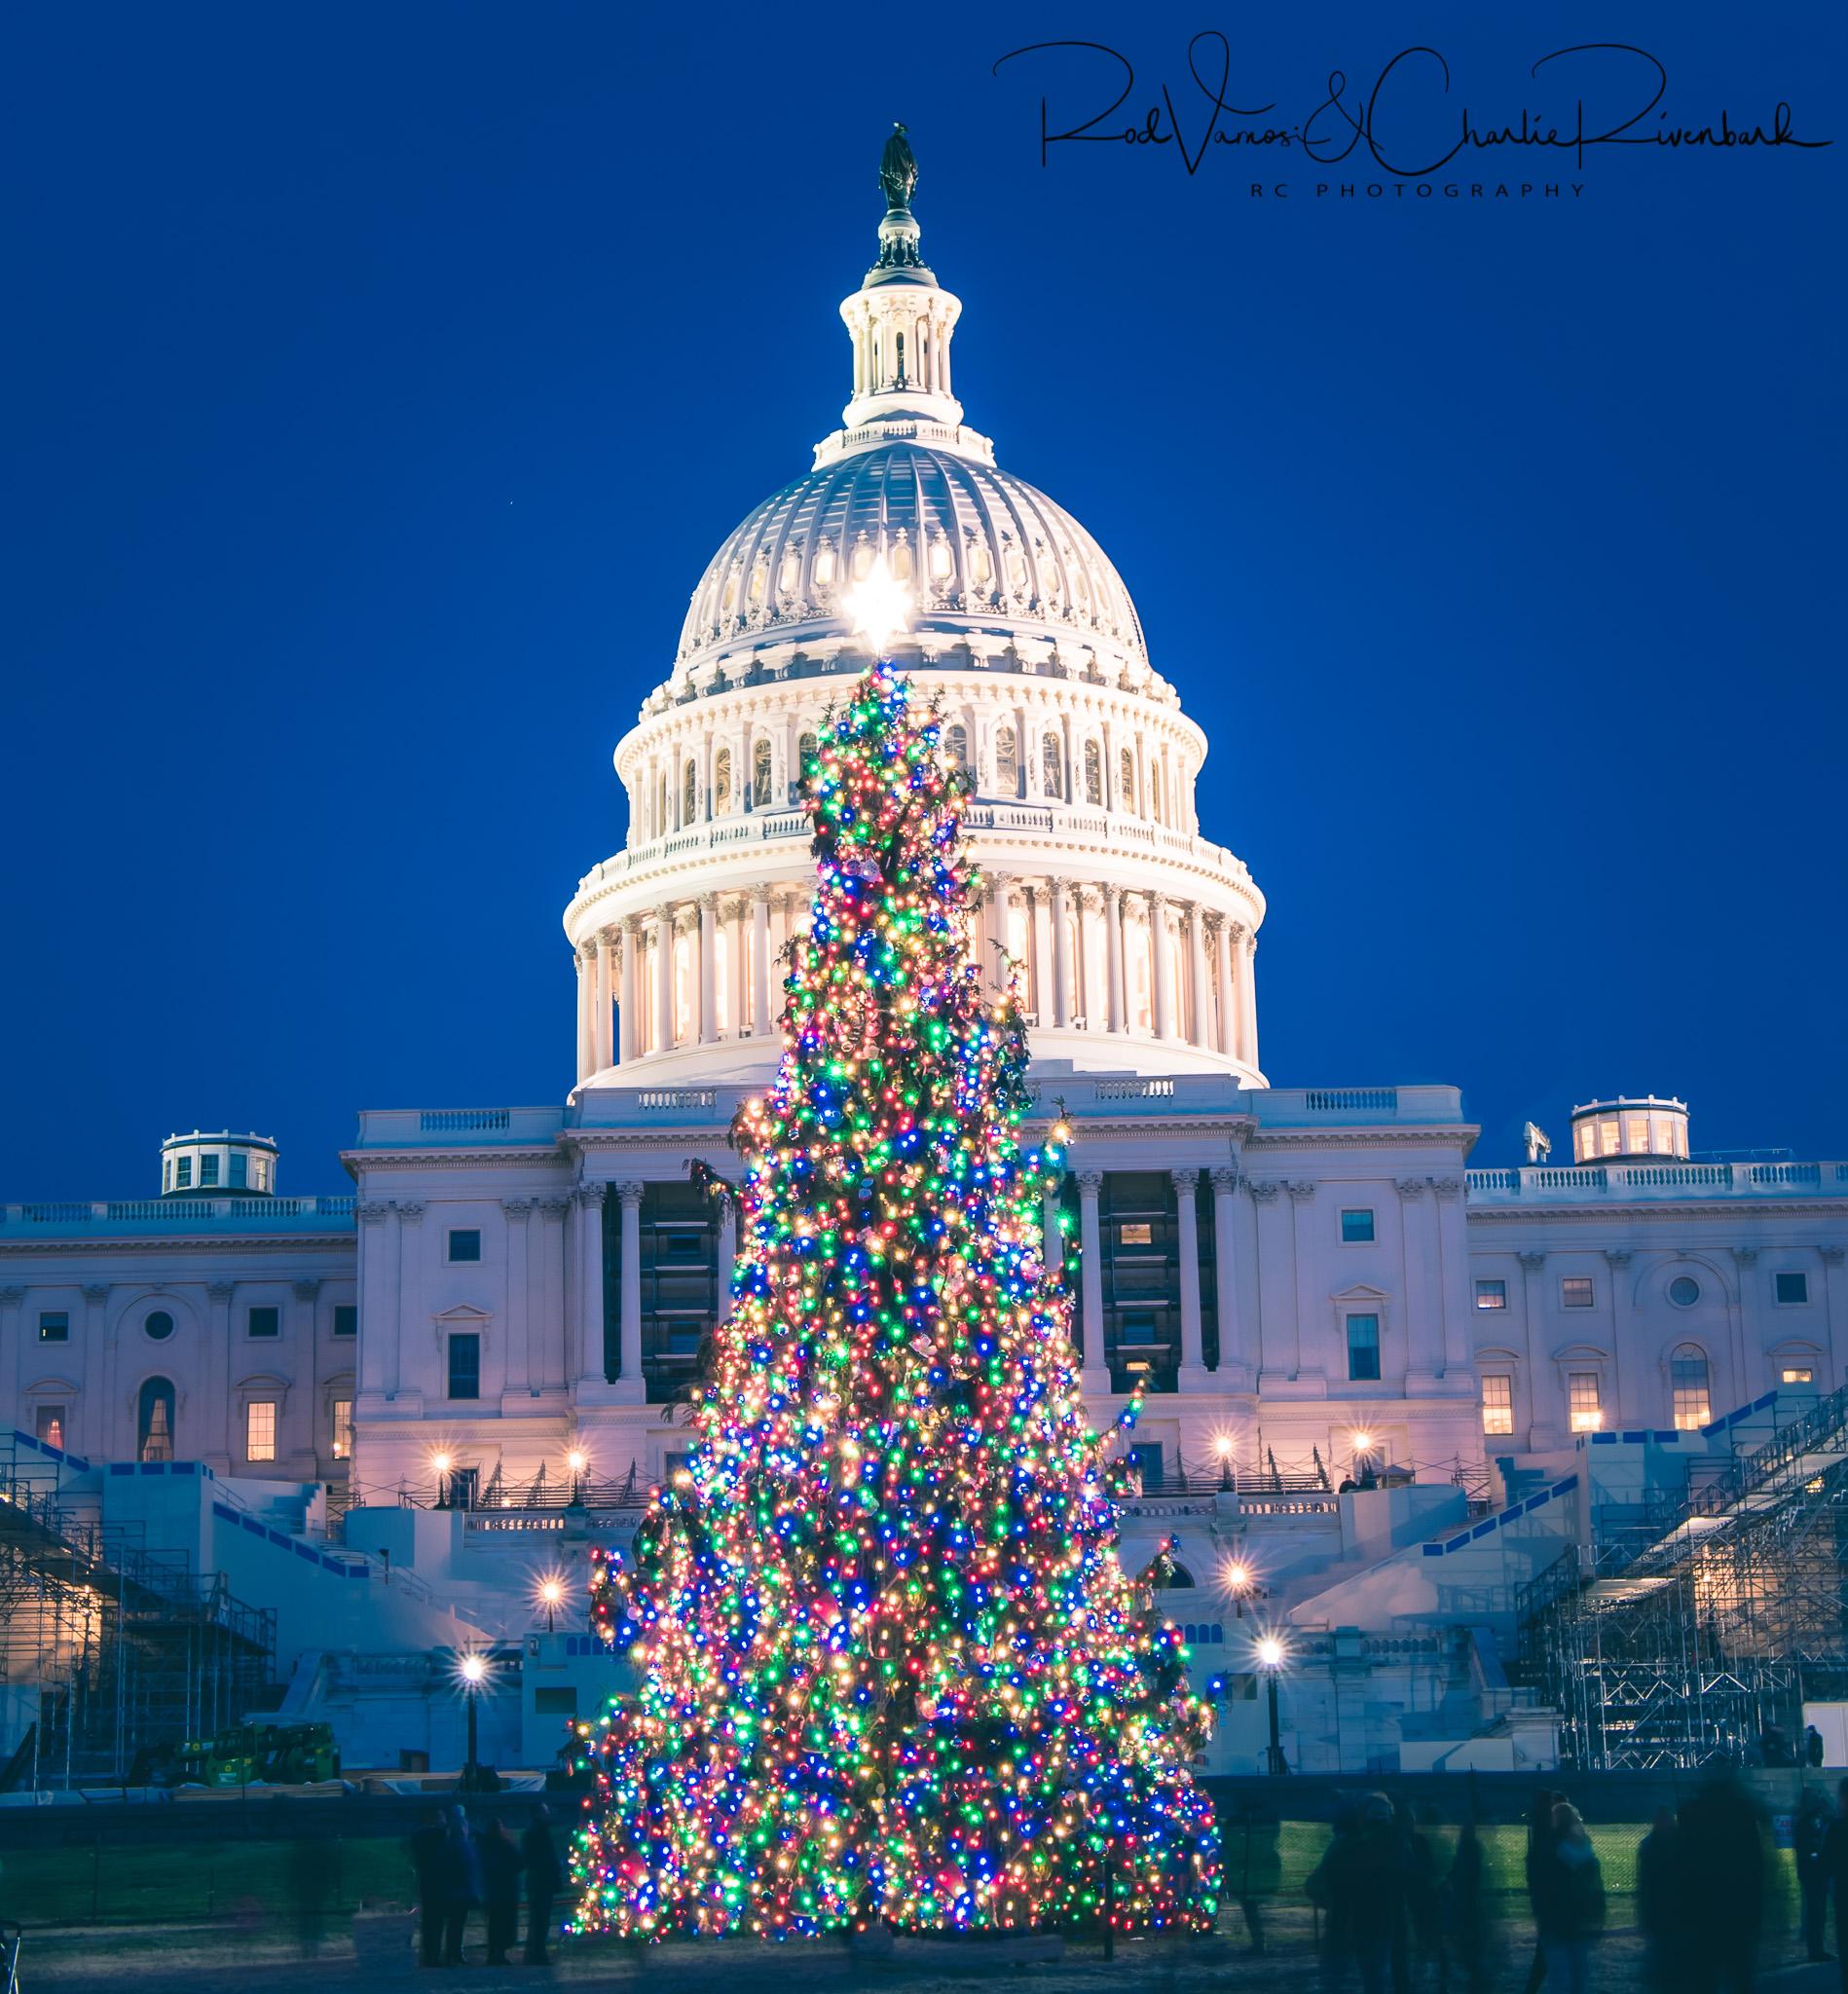 58088F - US Capital w/Christmas Tree